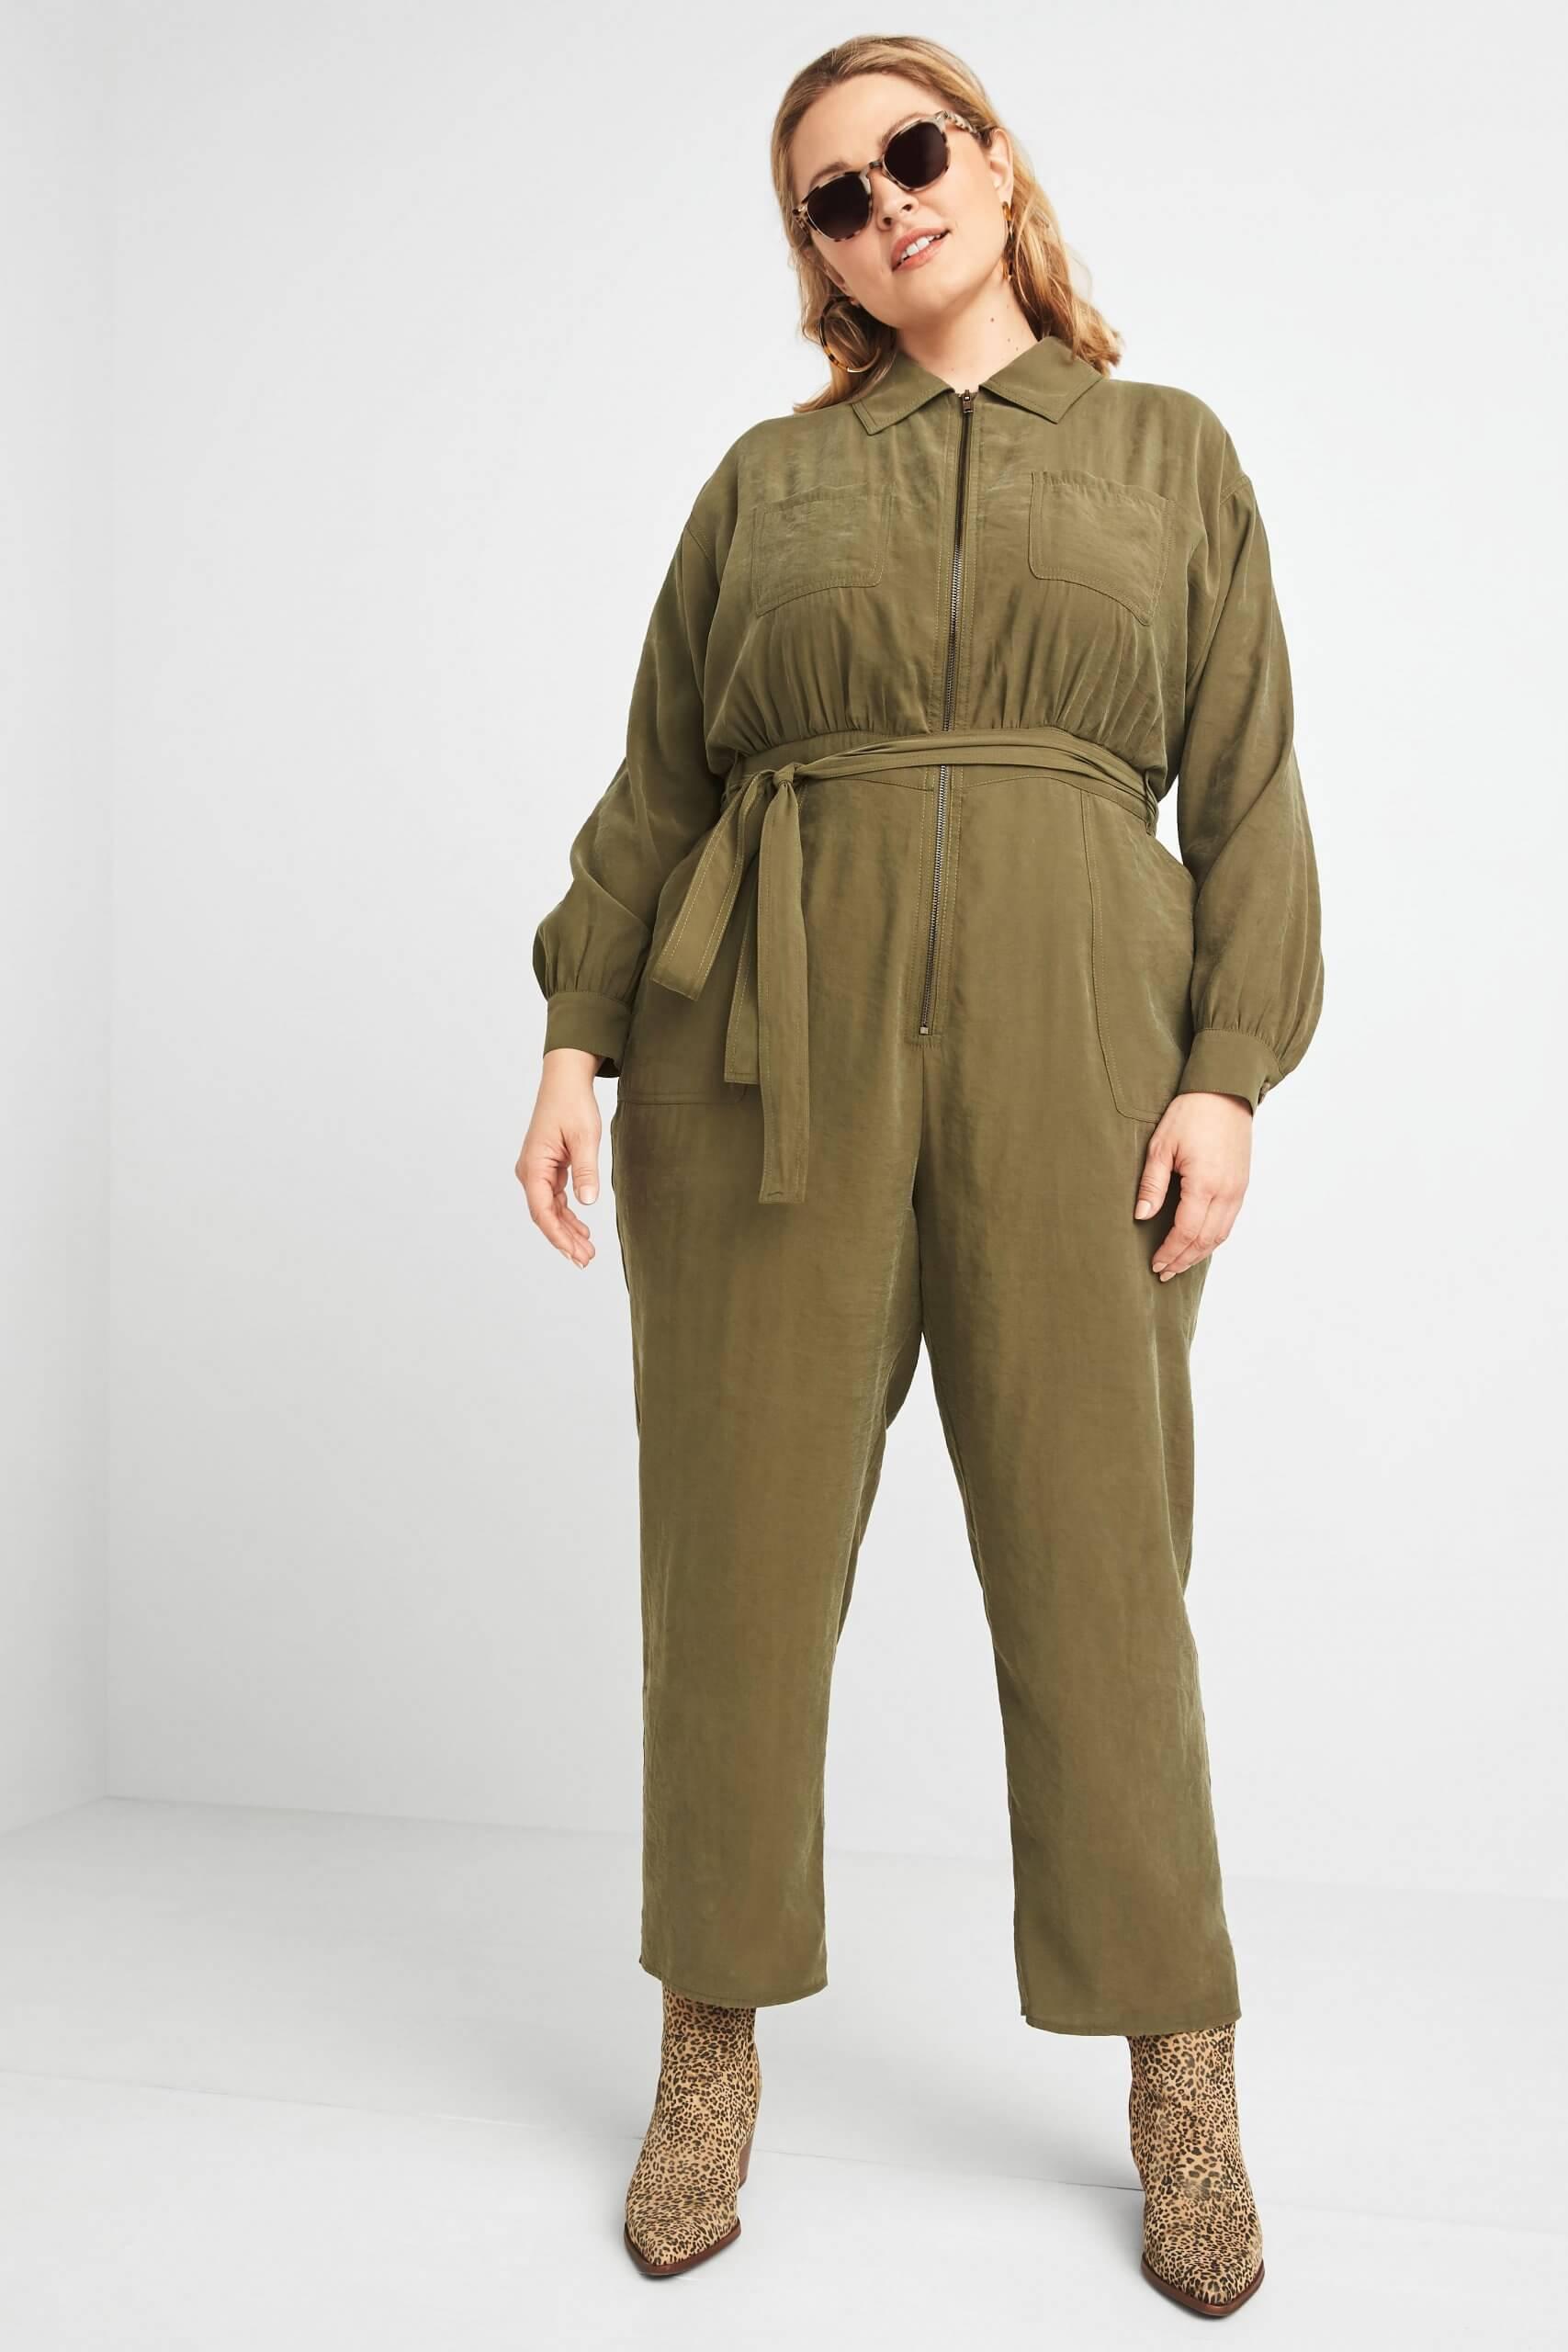 Stitch Fix Women's model wearing olive green long-sleeve jumpsuit with tie-waist.